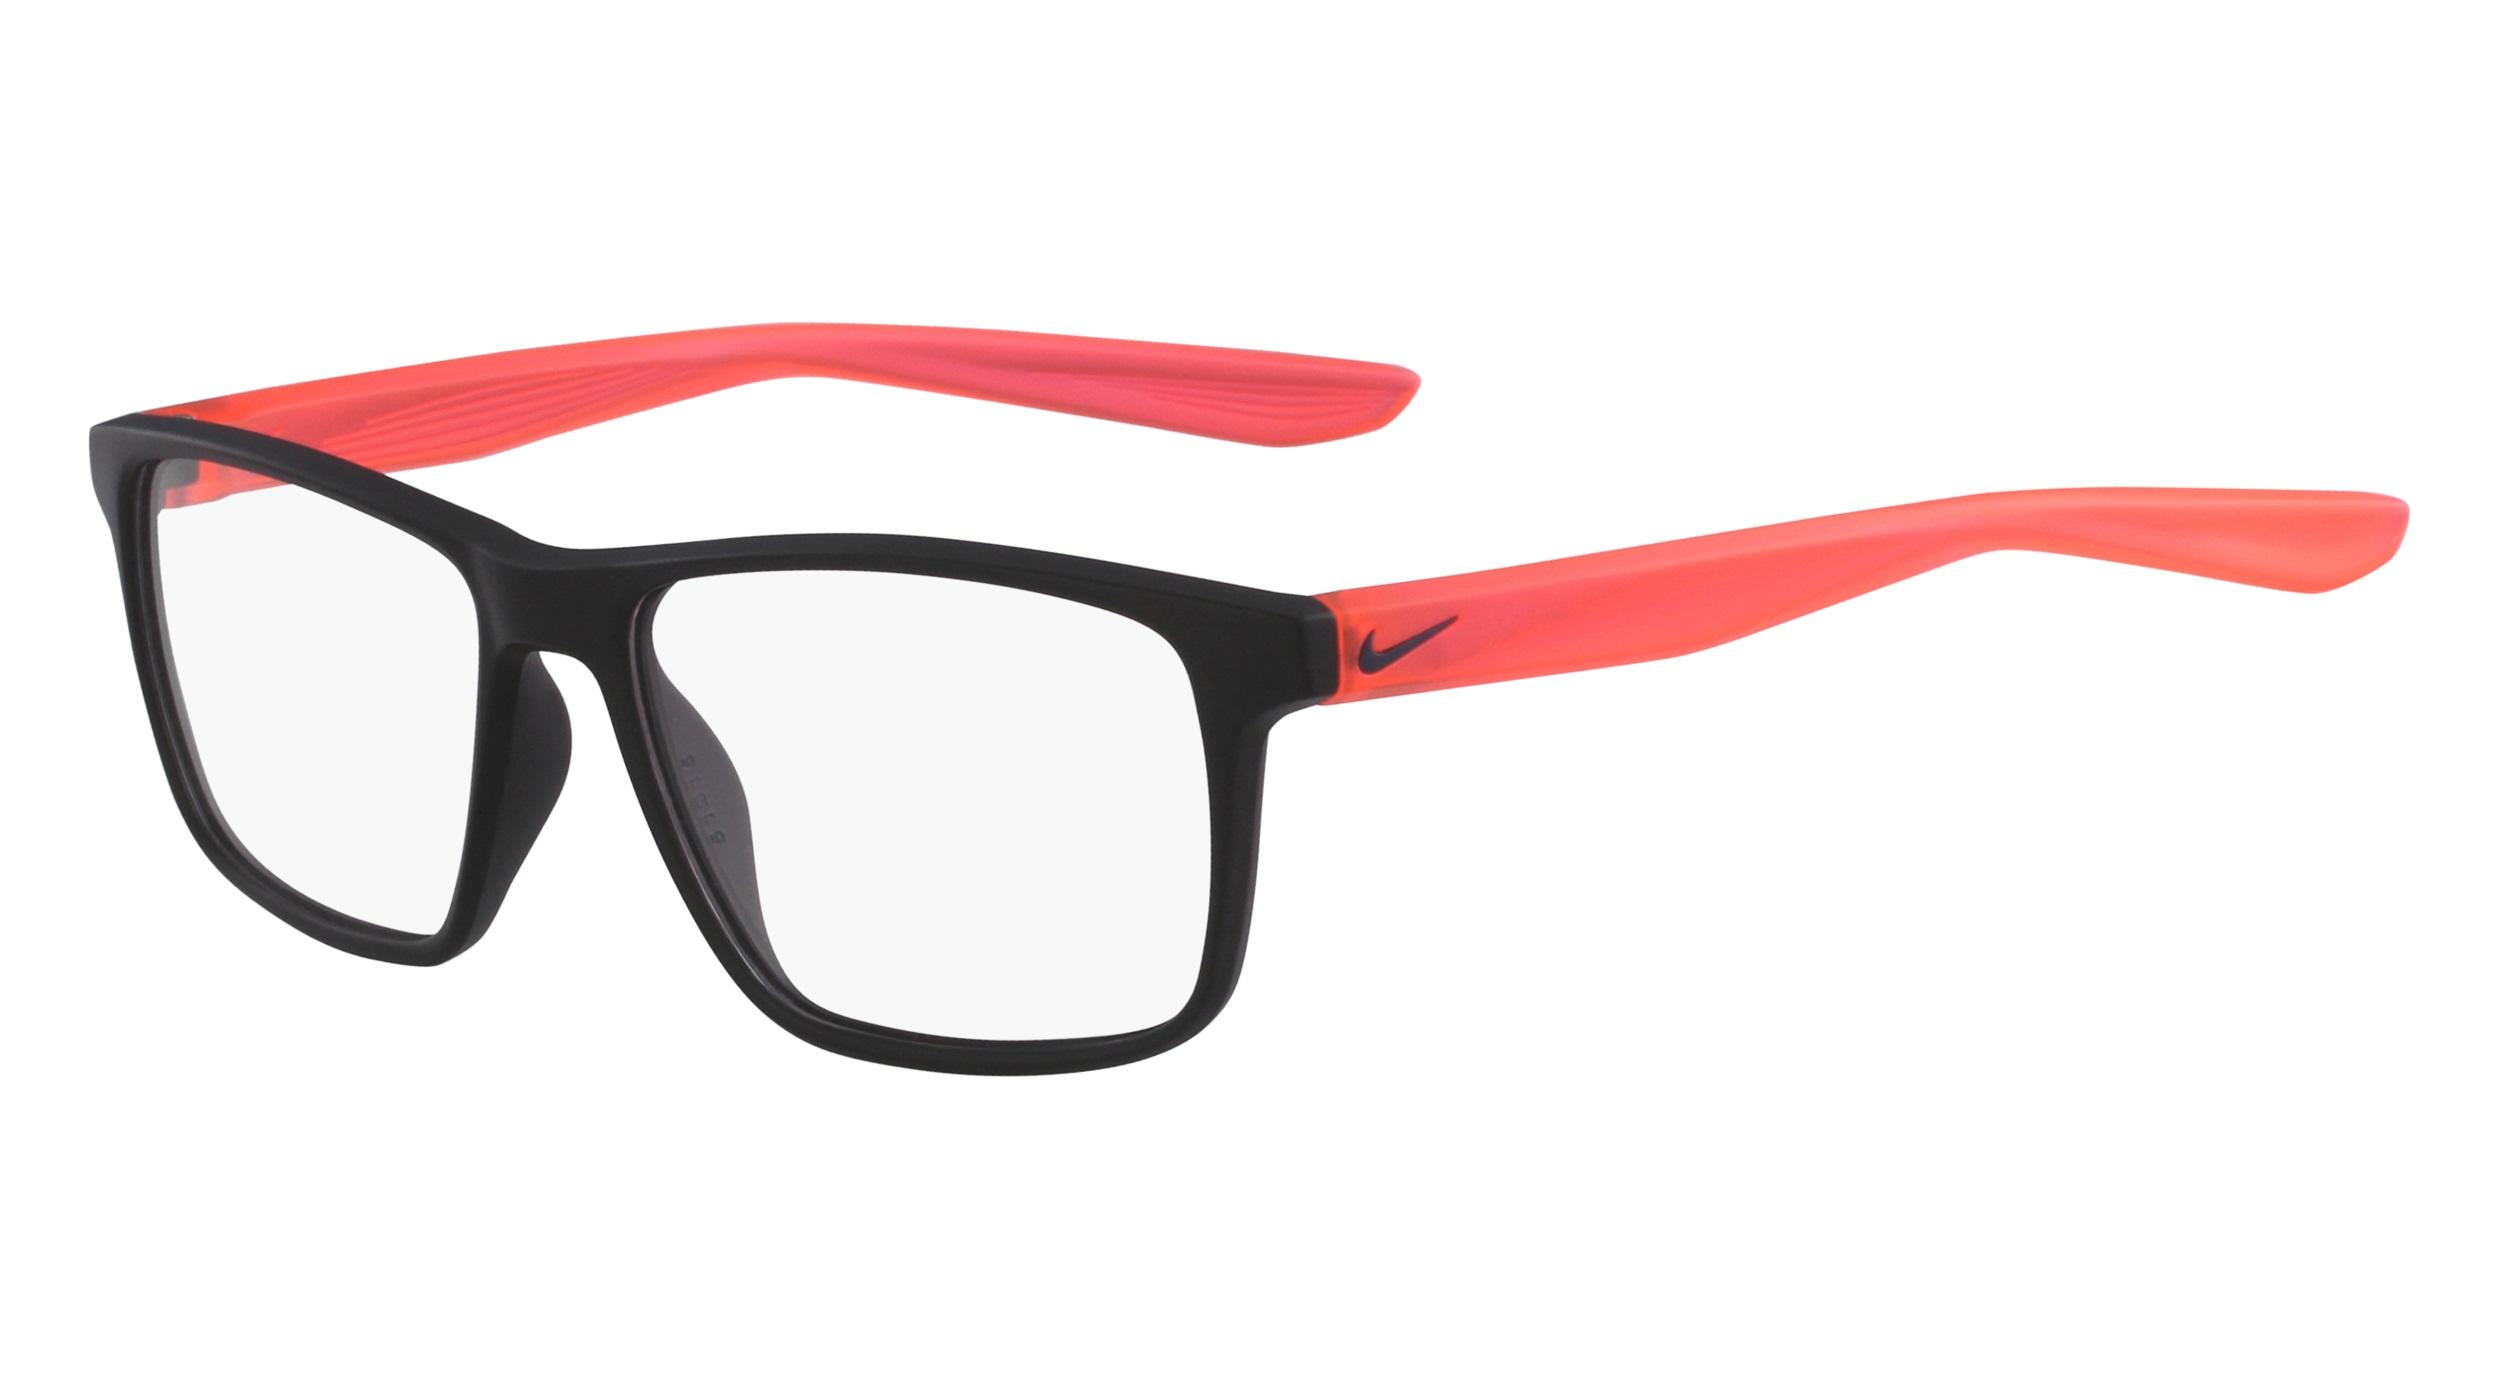 0ff9ddda16a Nike 5002-002 Kids Eyeglasses Matte Black Solar Red Nike5002-002 - Optiwow